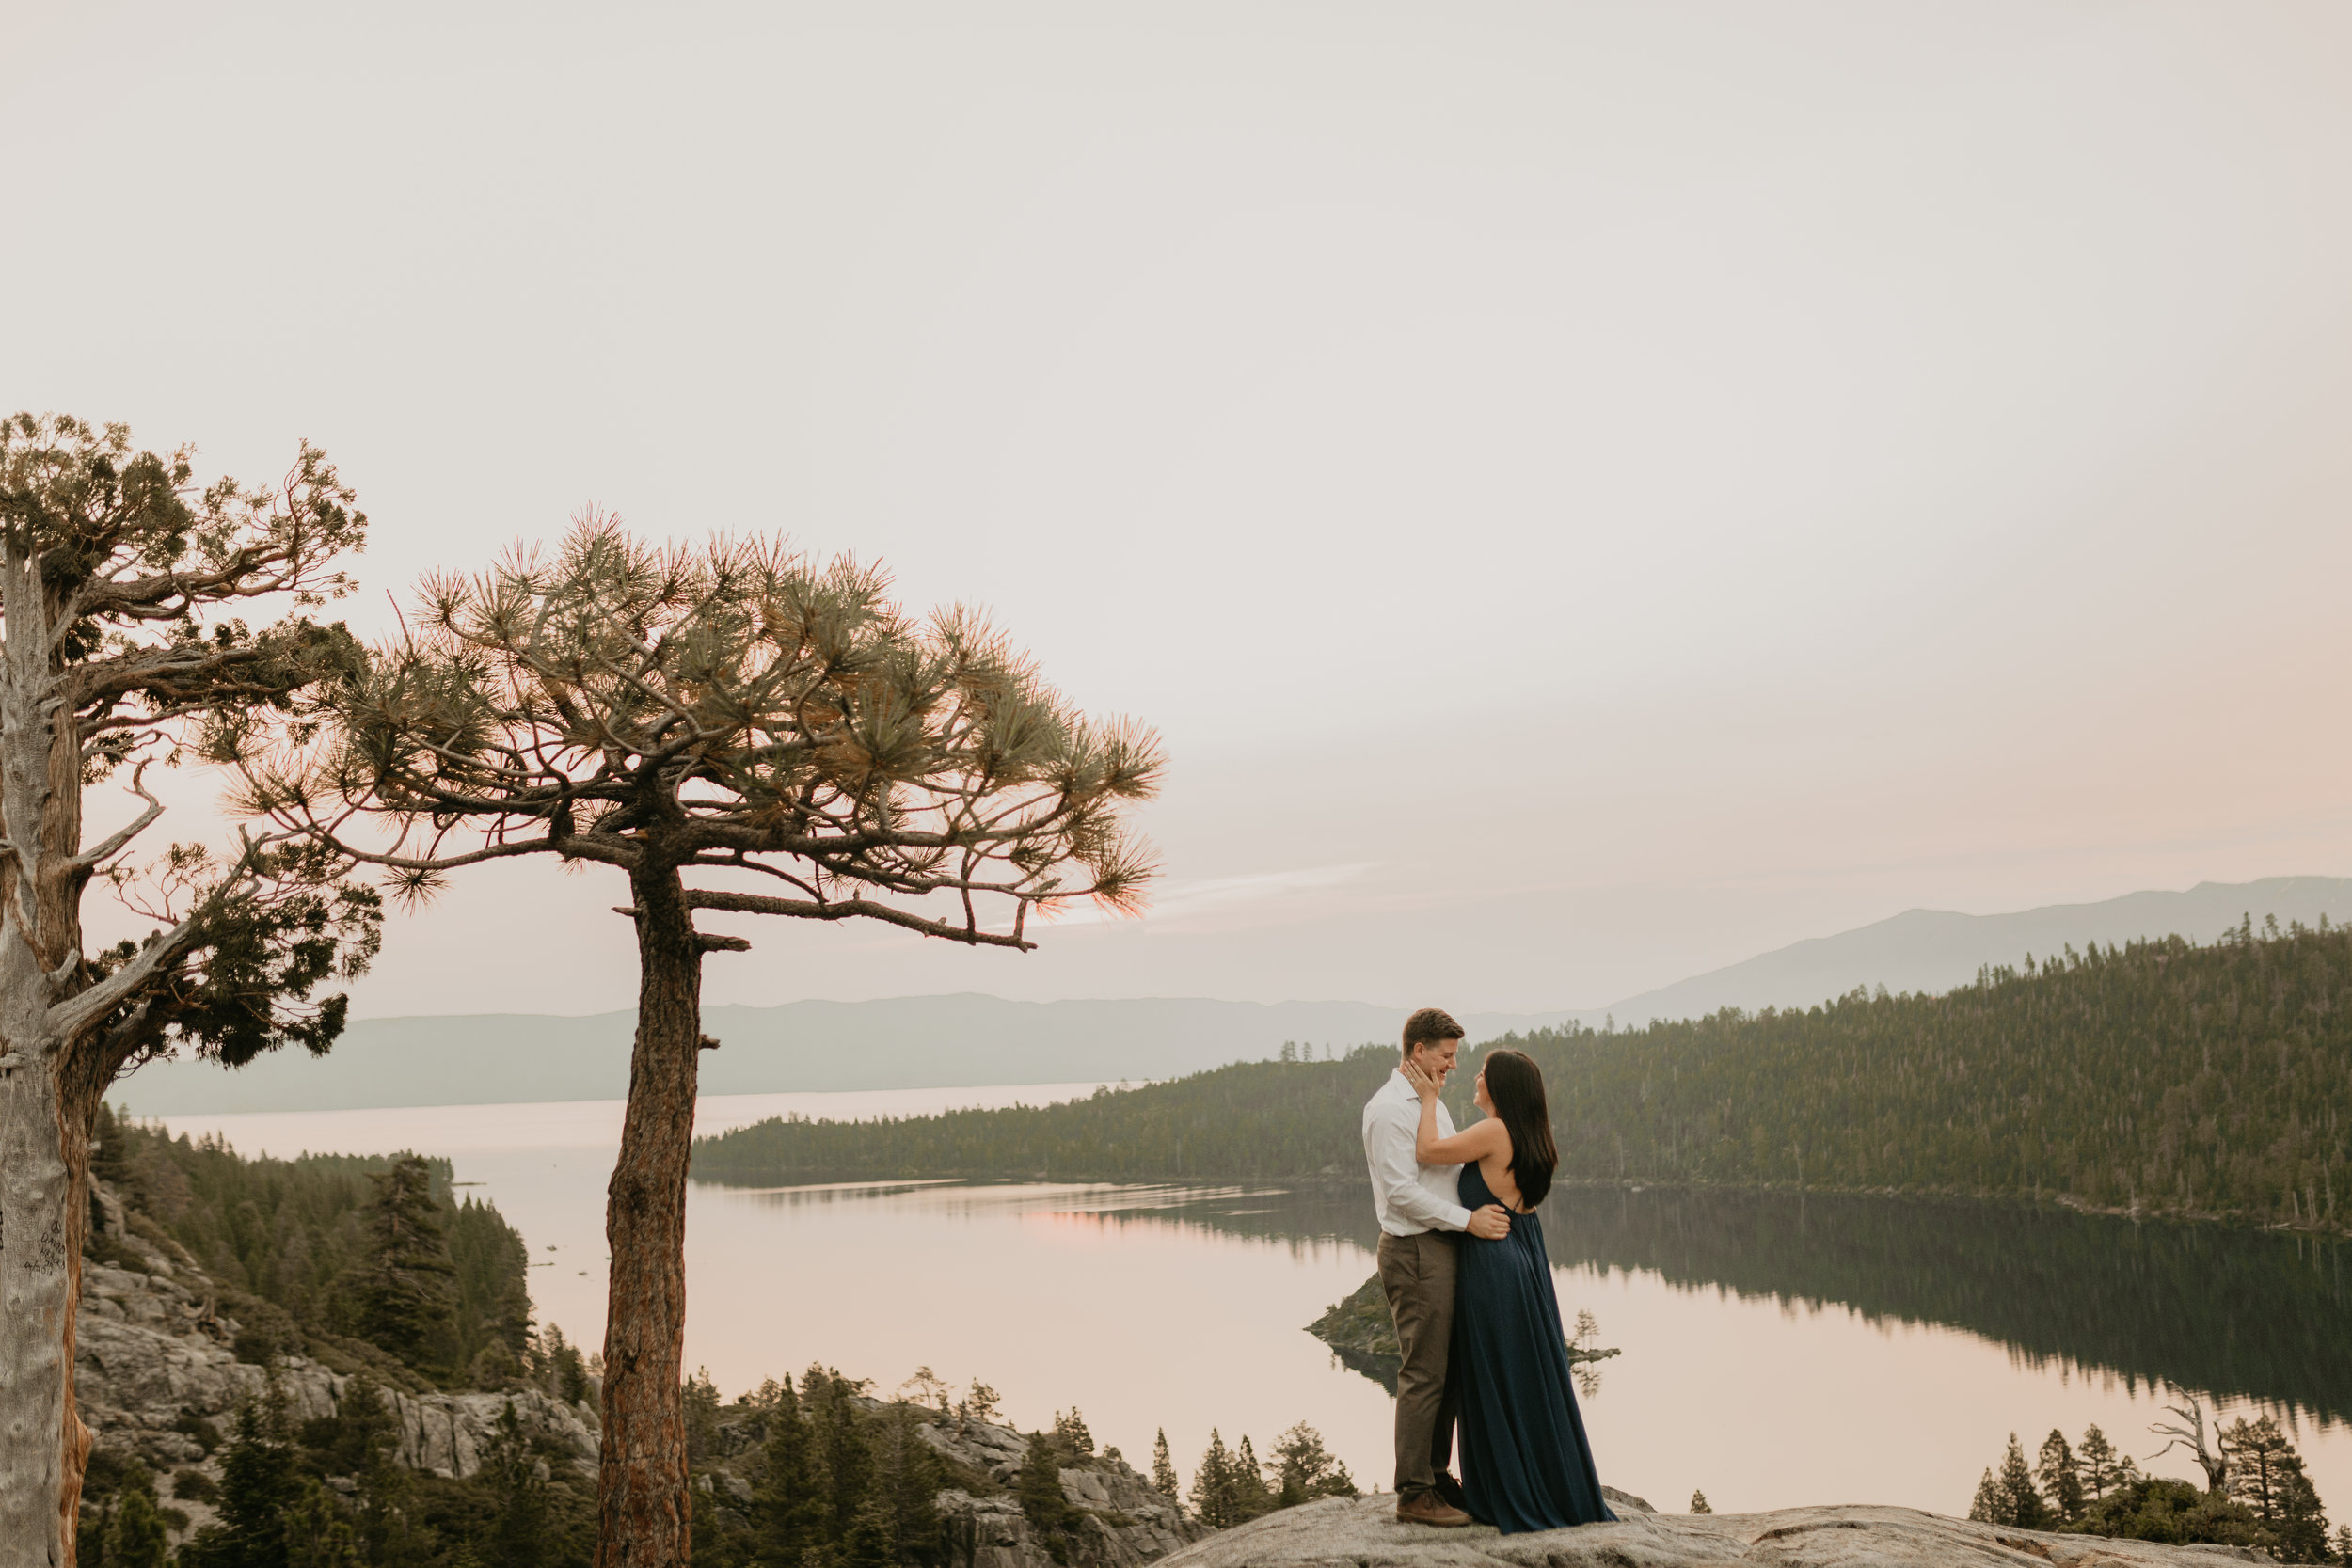 nicole-daacke-photography-lake-tahoe-sunrise-summer-adventure-engagement-photos-nevada-wedding-elopement-photographer-golden-emerald-bay-light-pine-trees-summer-vibe-fun-carefree-authentic-love-2.jpg